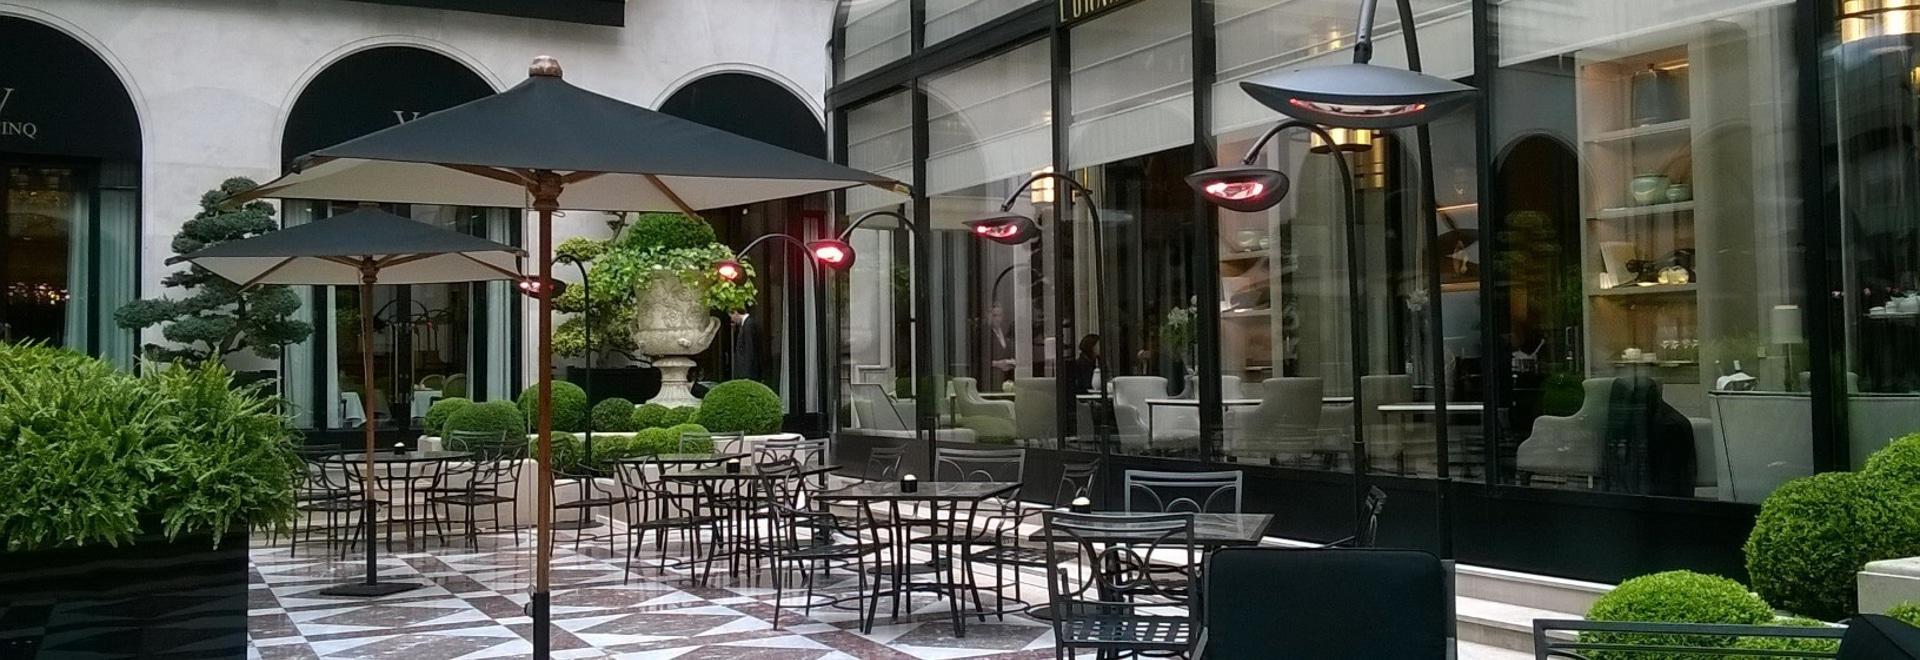 Hotel George V Parigi di Four Seasons